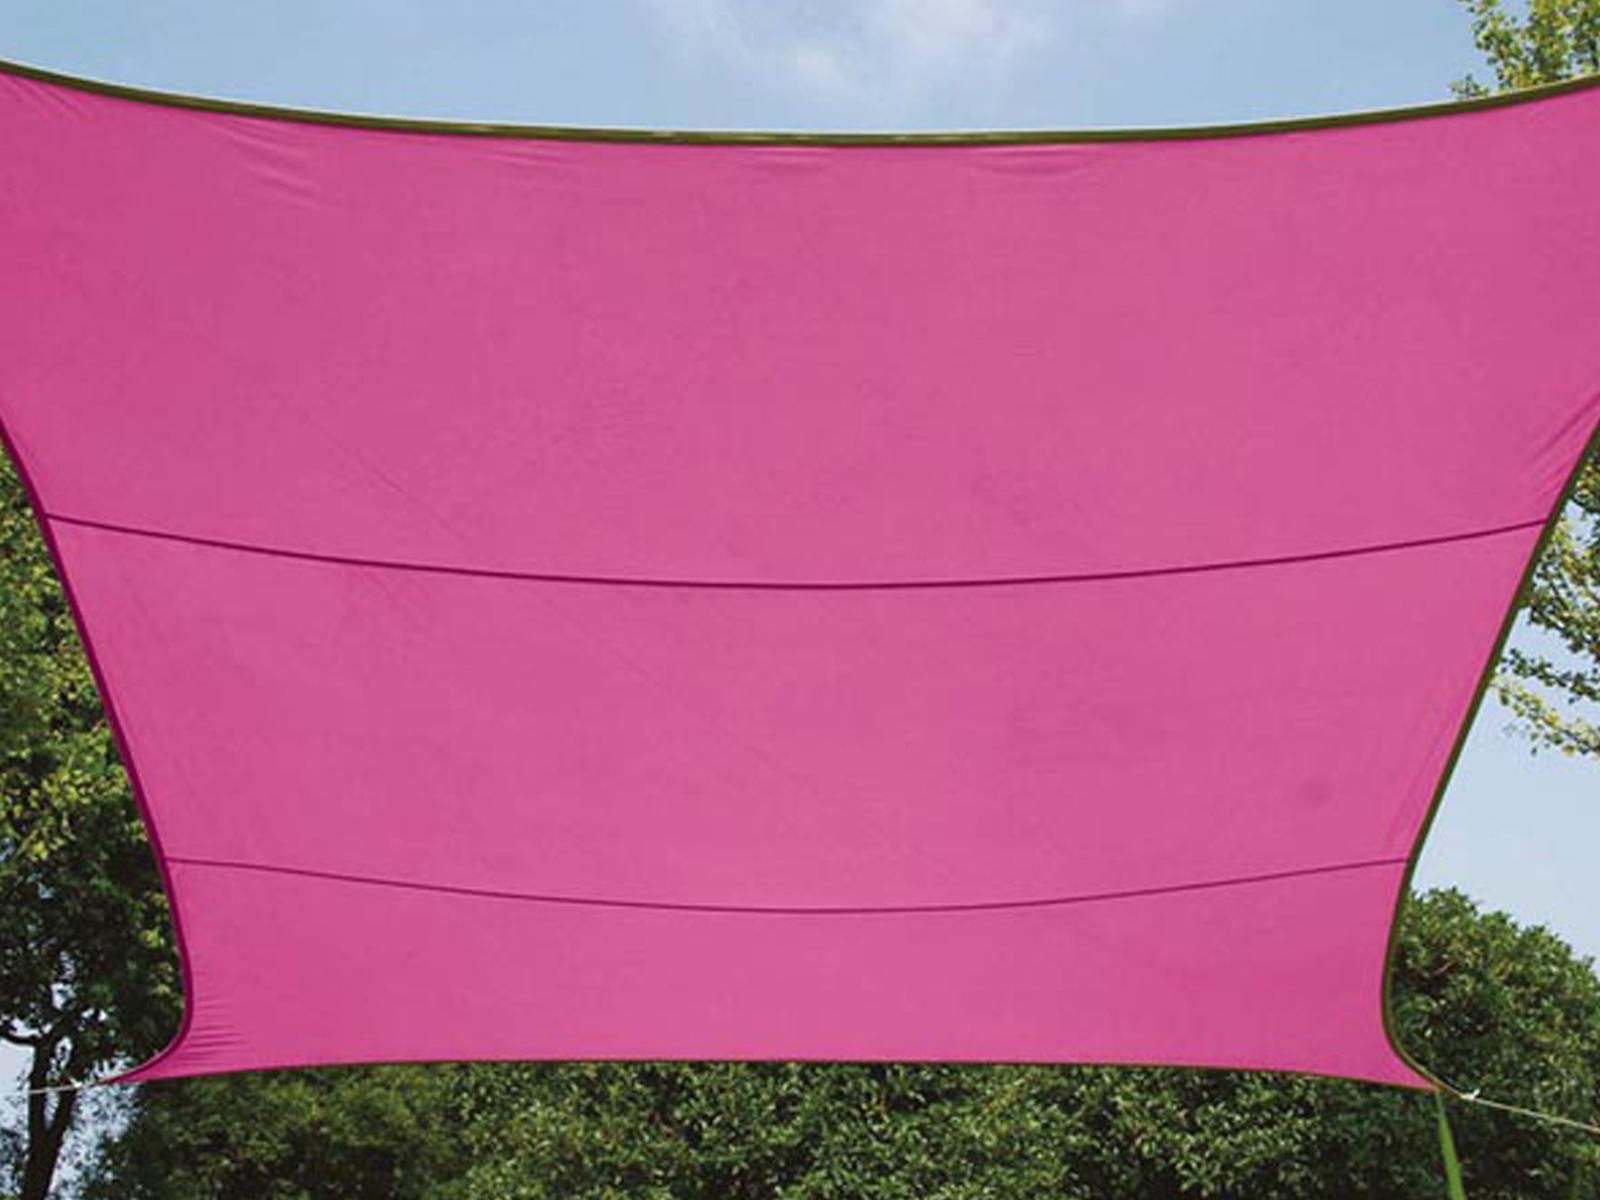 Sonnensegel Regenschutz Quadrat PEREL, Fuchsia, 500 x 500 cm, cm, 500 Wasserabweisend f35e6e